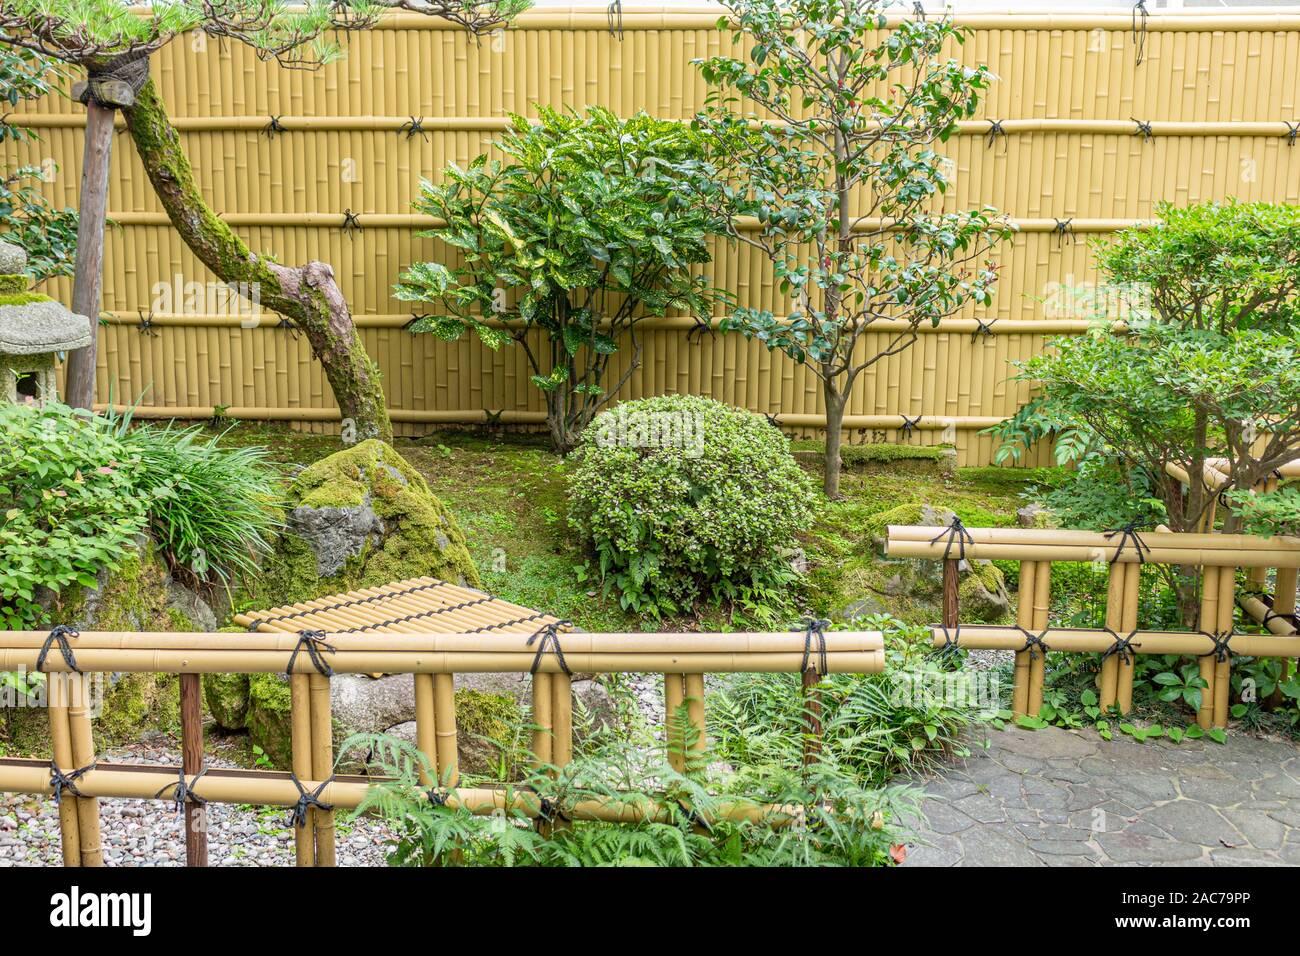 Summer View Of Traditional Small Japanese Garden With Bamboo And Stone Lantern Kanazawa City Ishikawa Prefecture Japan Stock Photo Alamy